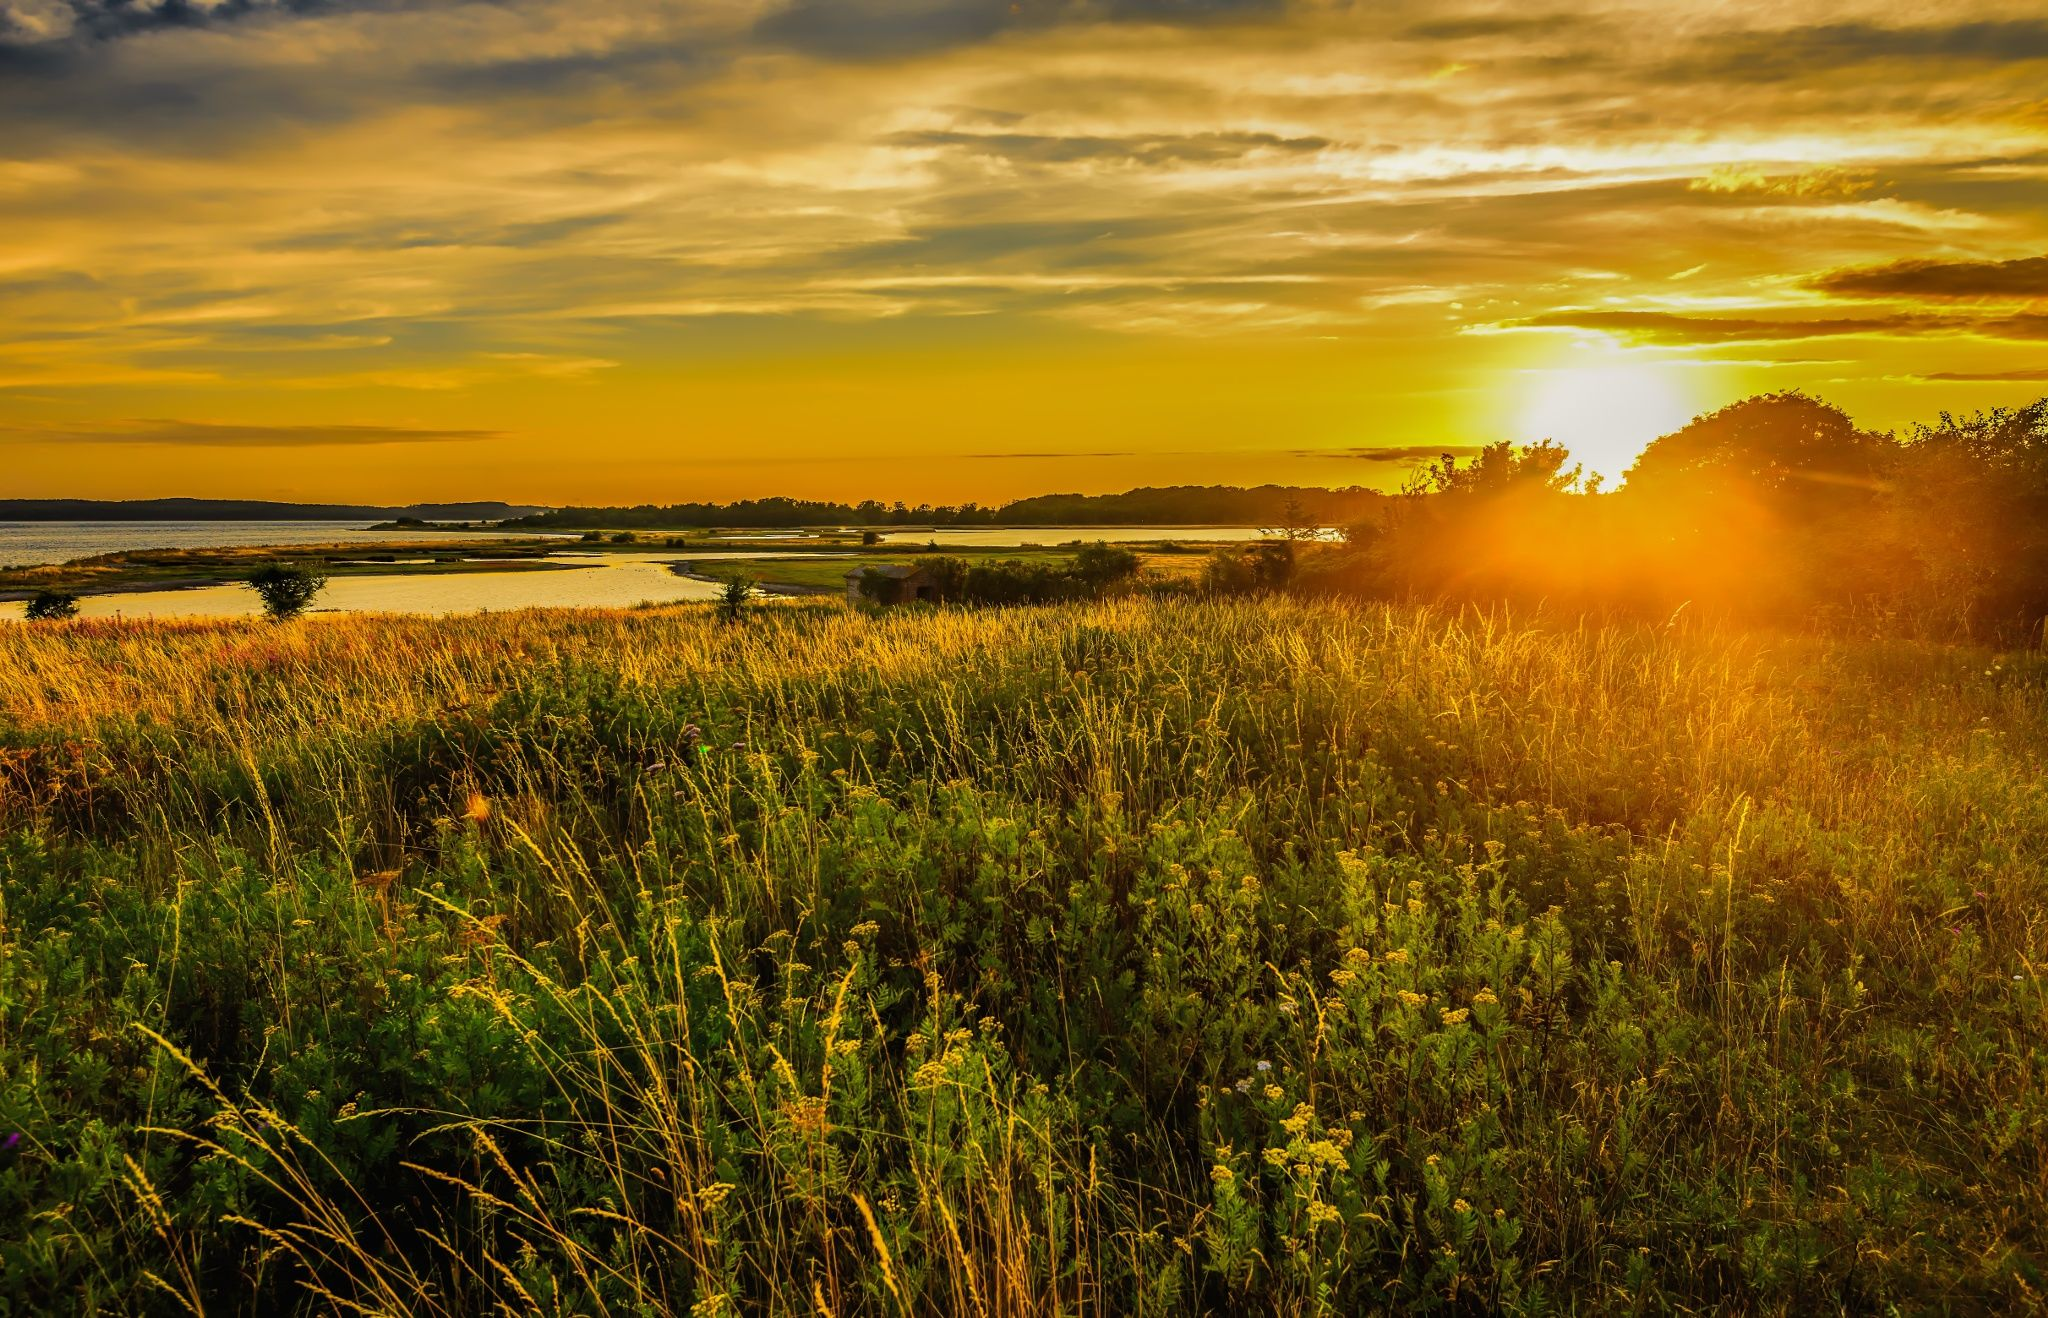 Sunset by AdMixStar / 500px Sunset, Landscape, Ipad air